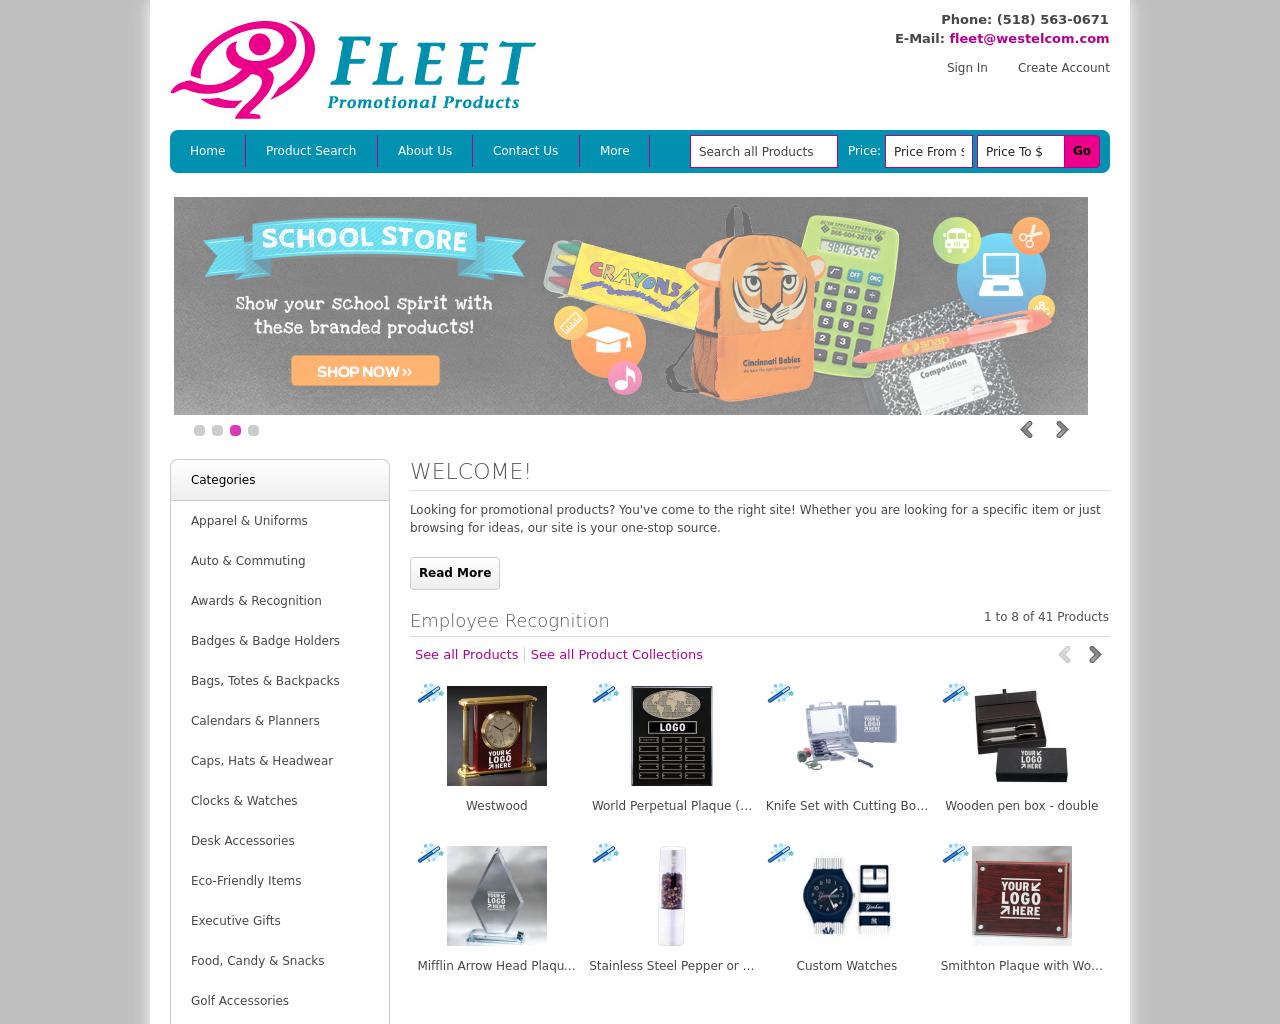 Fleet-Advertising-Reviews-Pricing